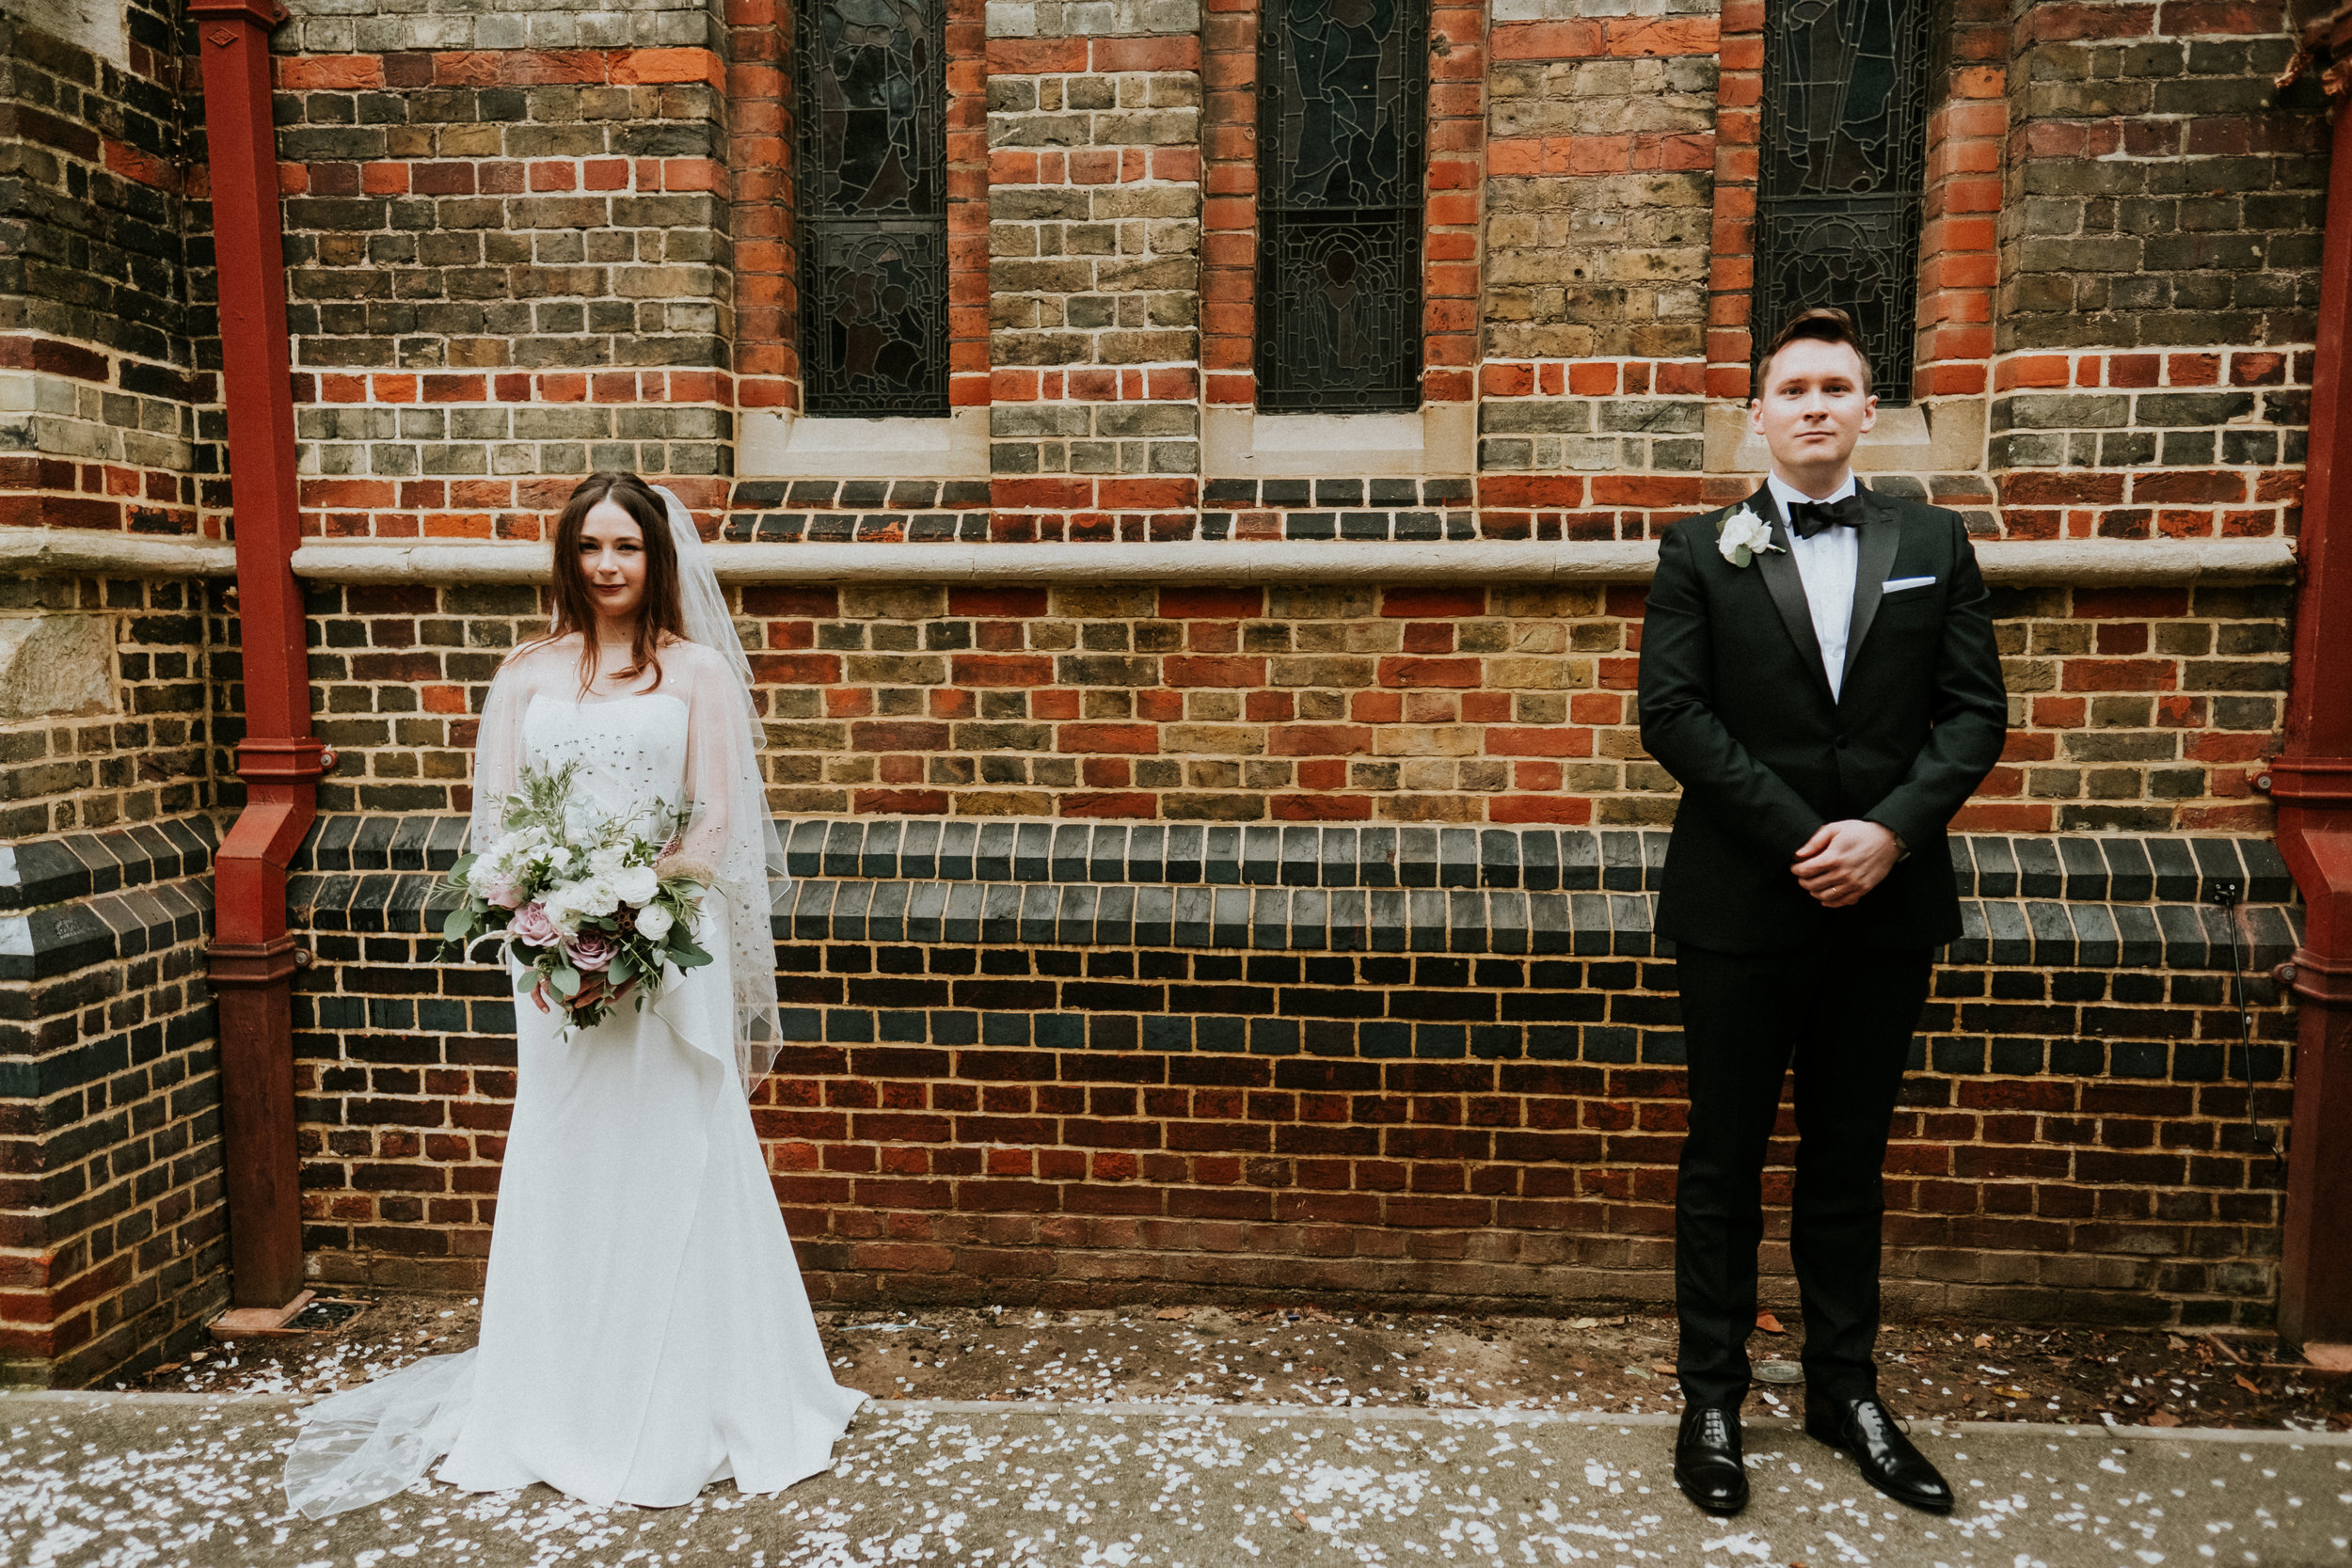 Lottie_Teddington_wedding_flowers_church.jpg